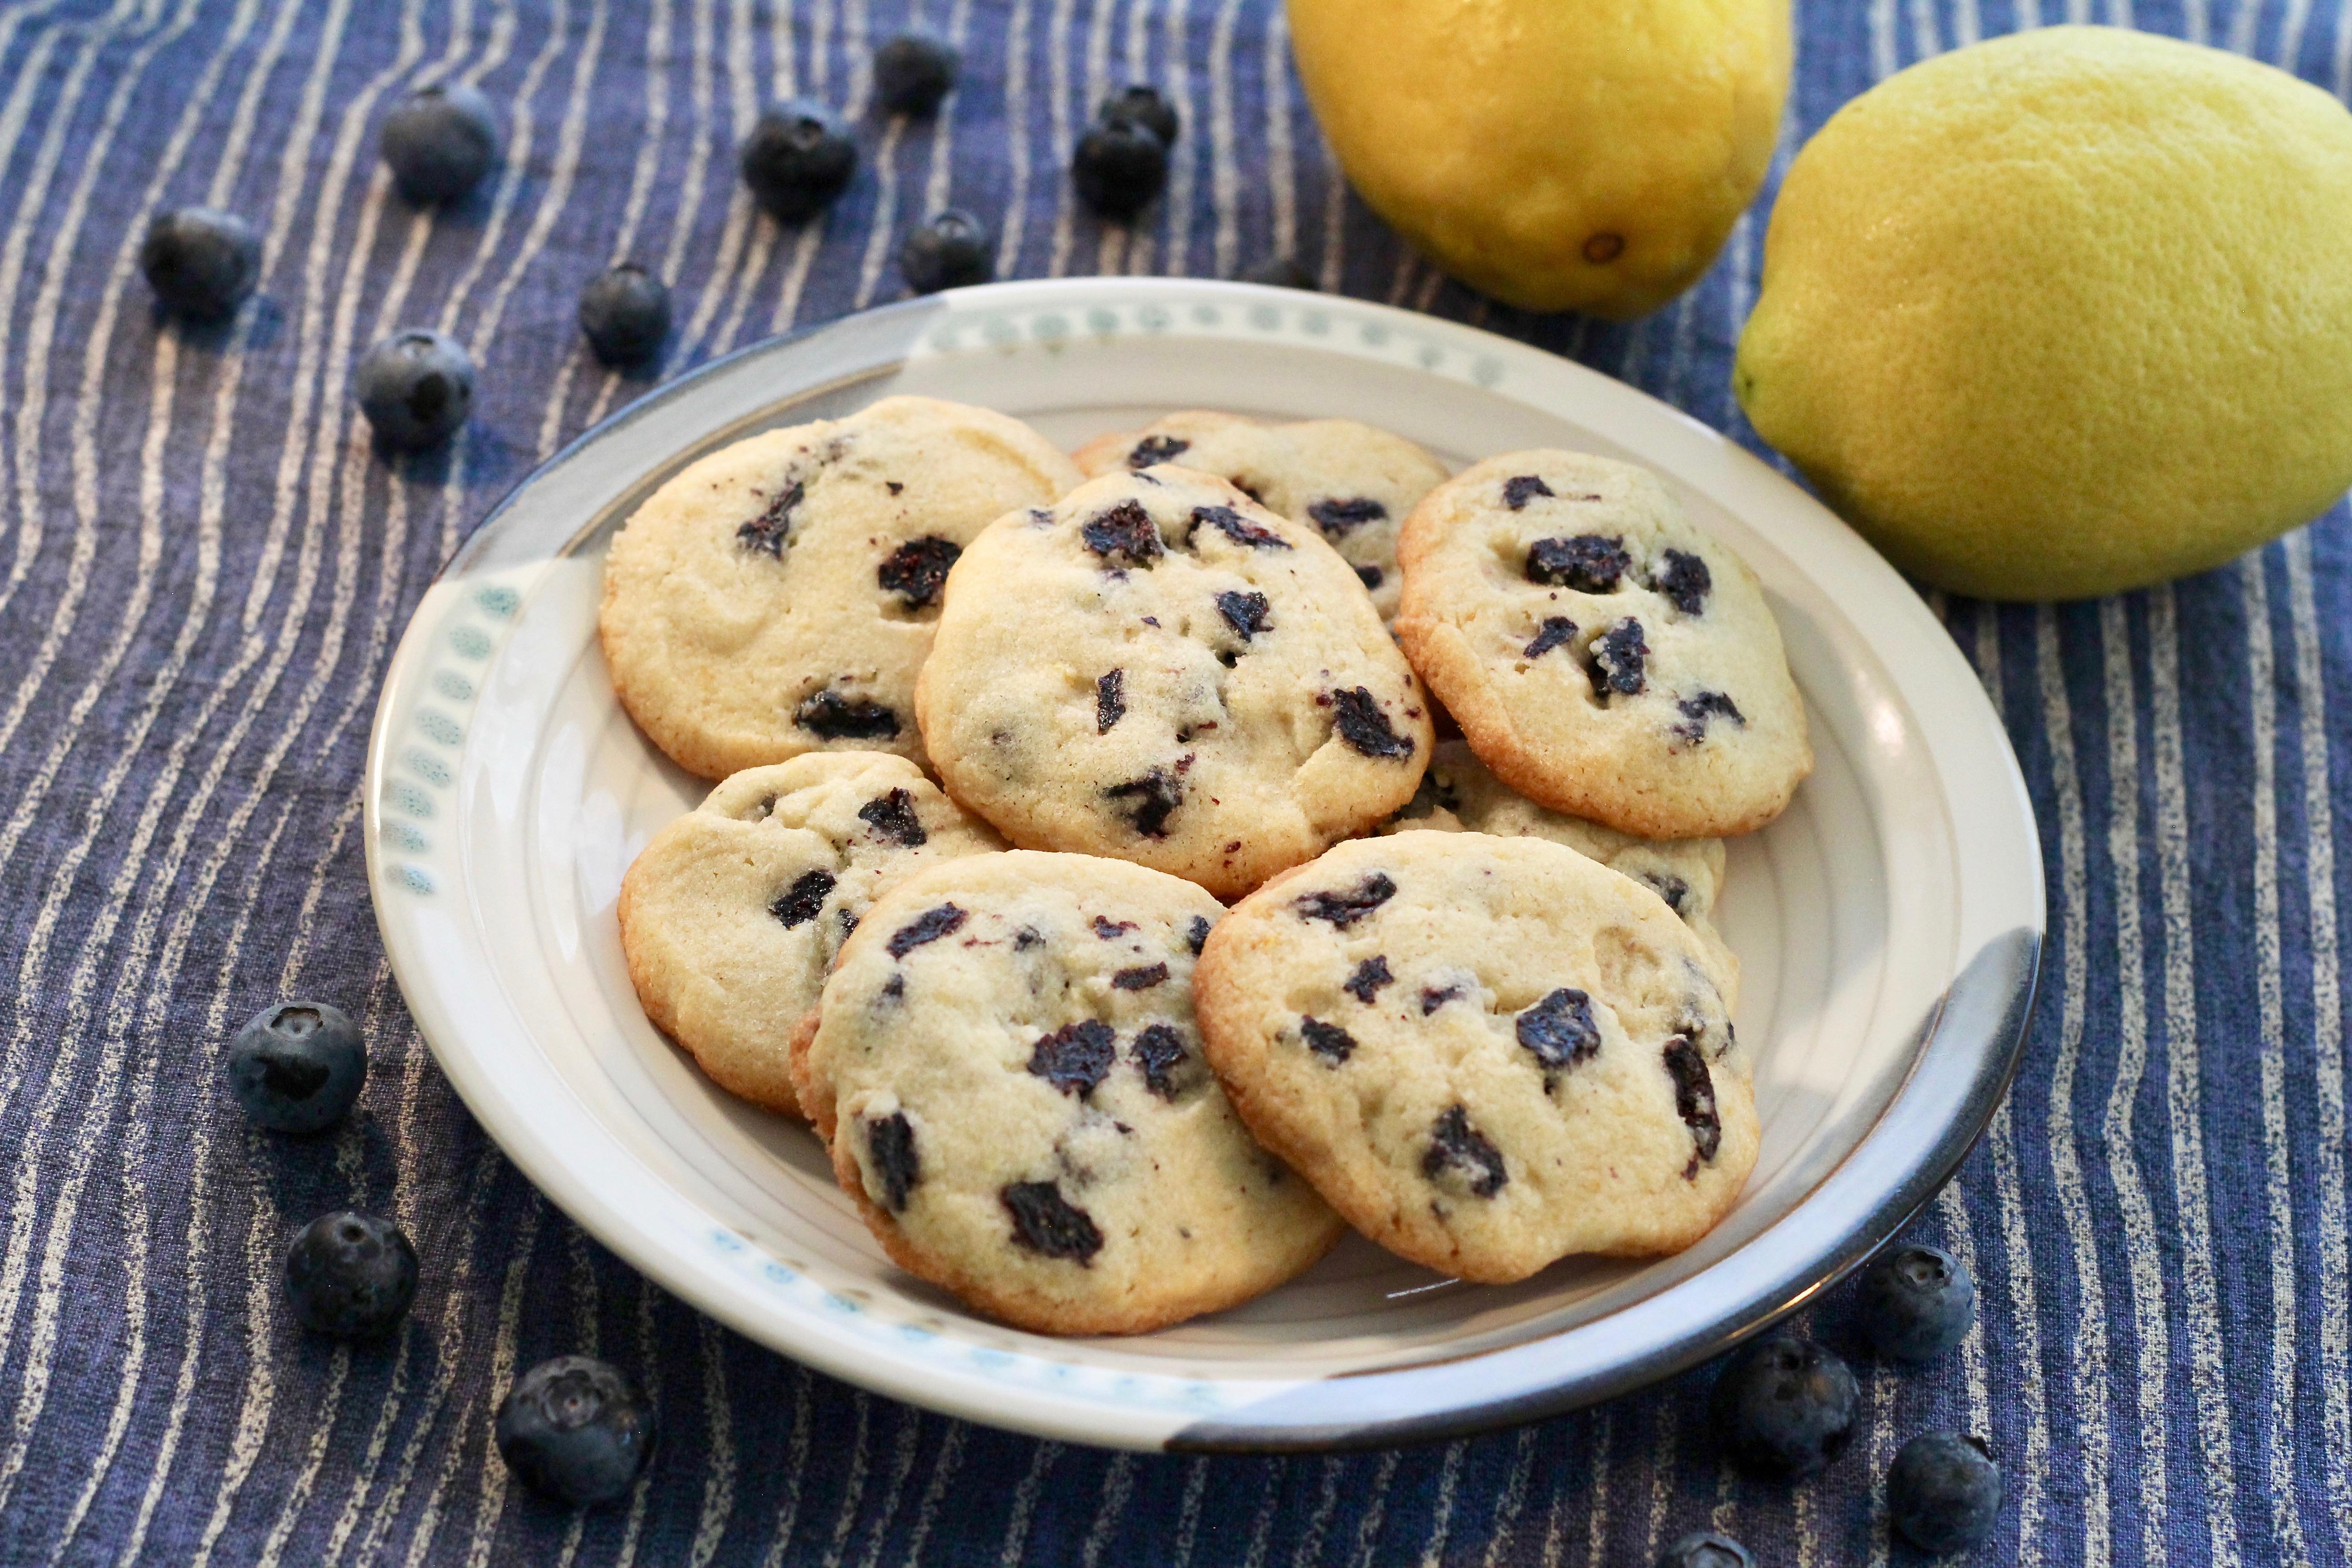 Blueberry-Lemon Butter Cookies